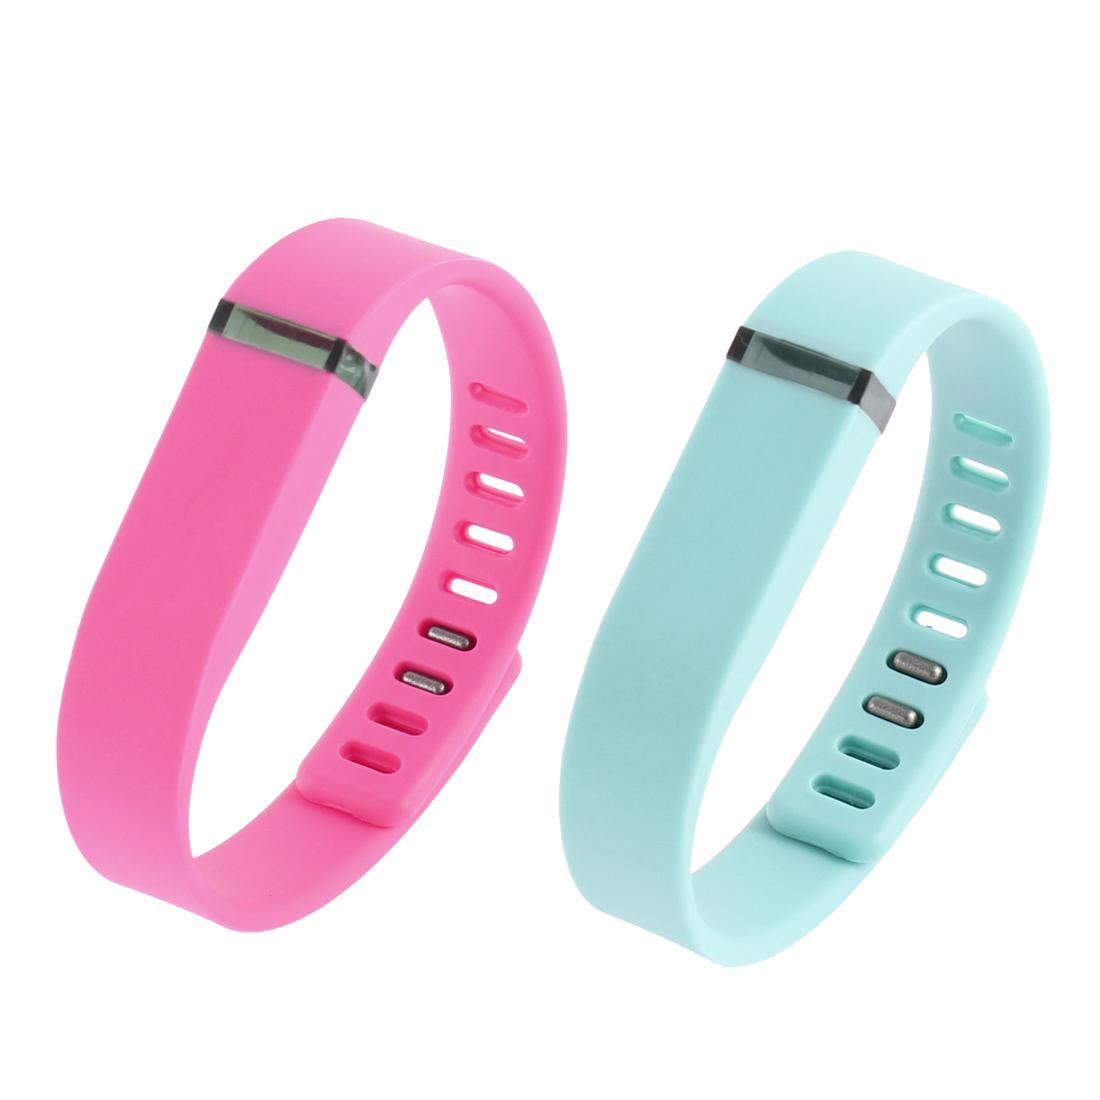 2 Pcs  Wrist Watch Band Strap w Clasps for Fitbit Flex Bracelet